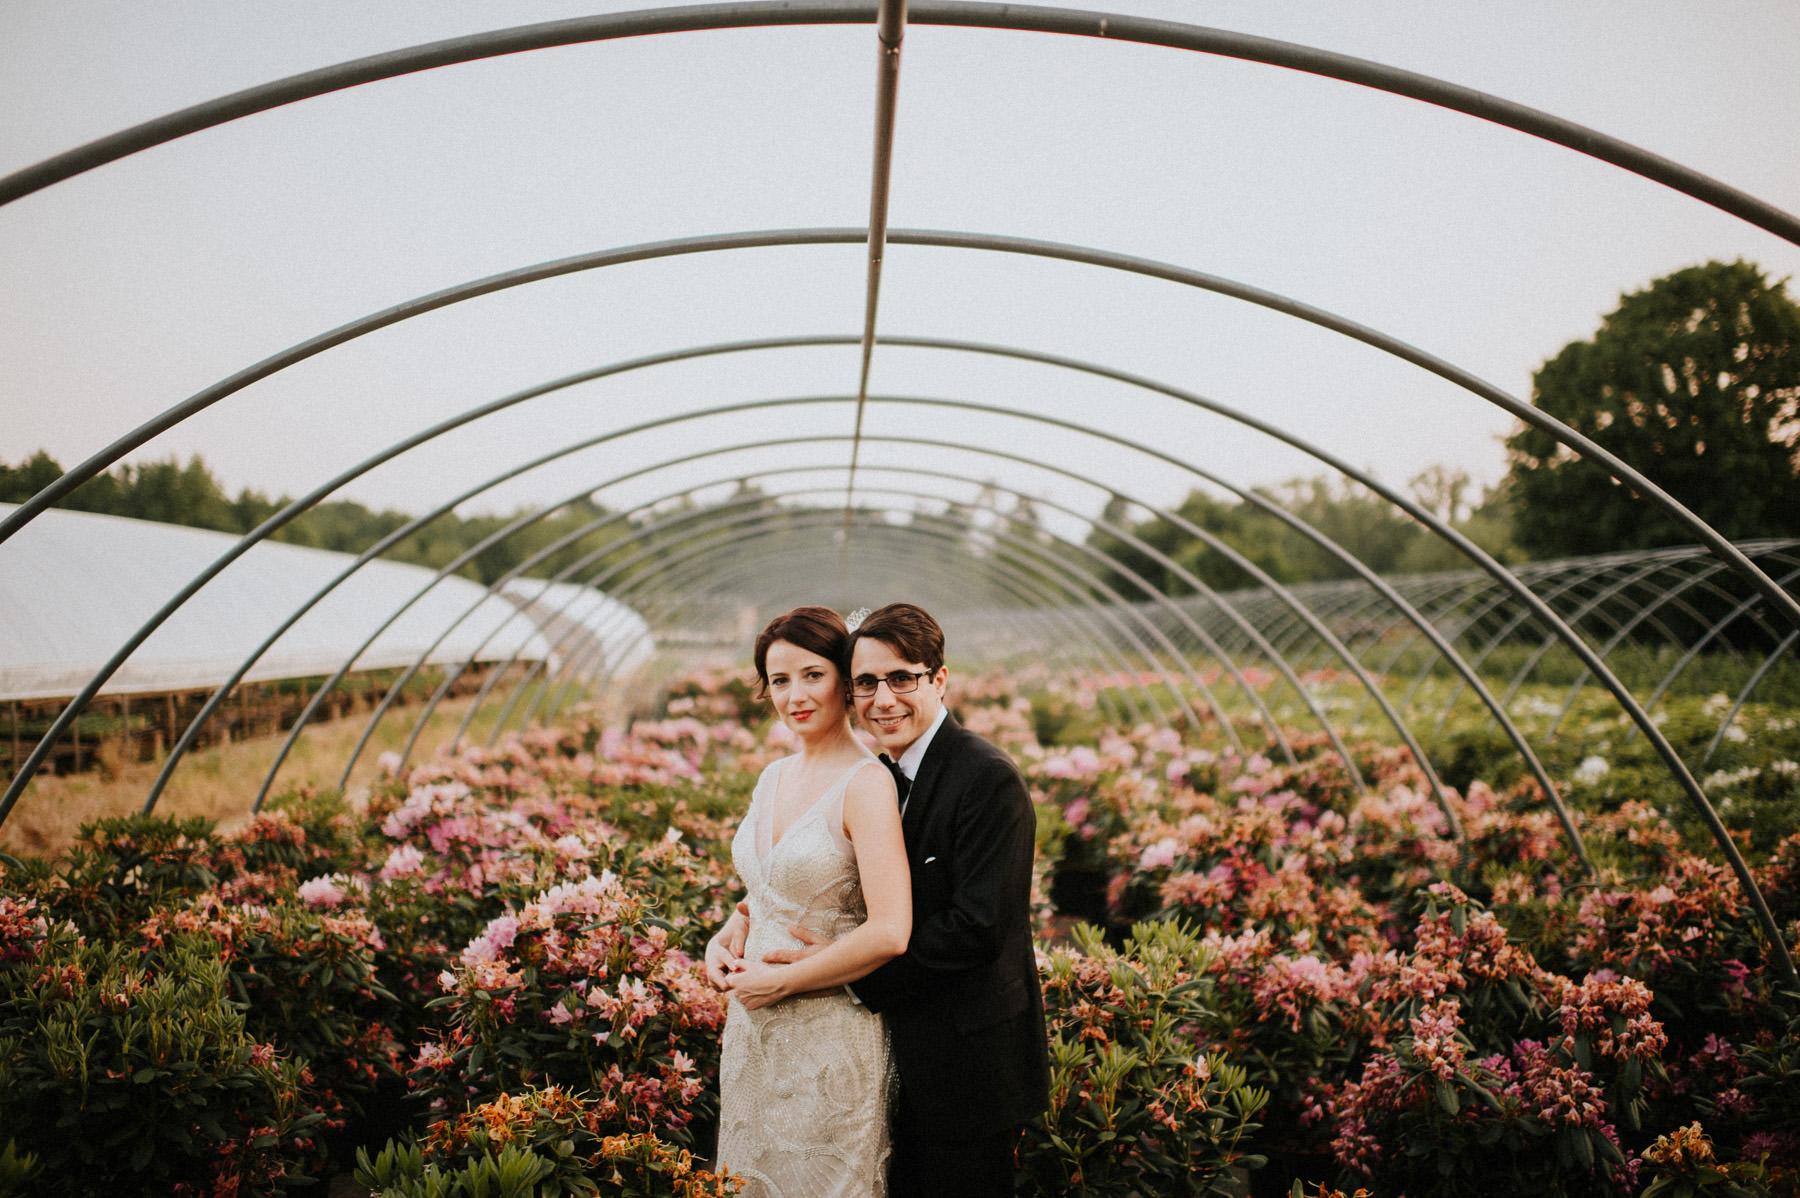 241-inn-at-fernbrook-farms-wedding-19.jpg